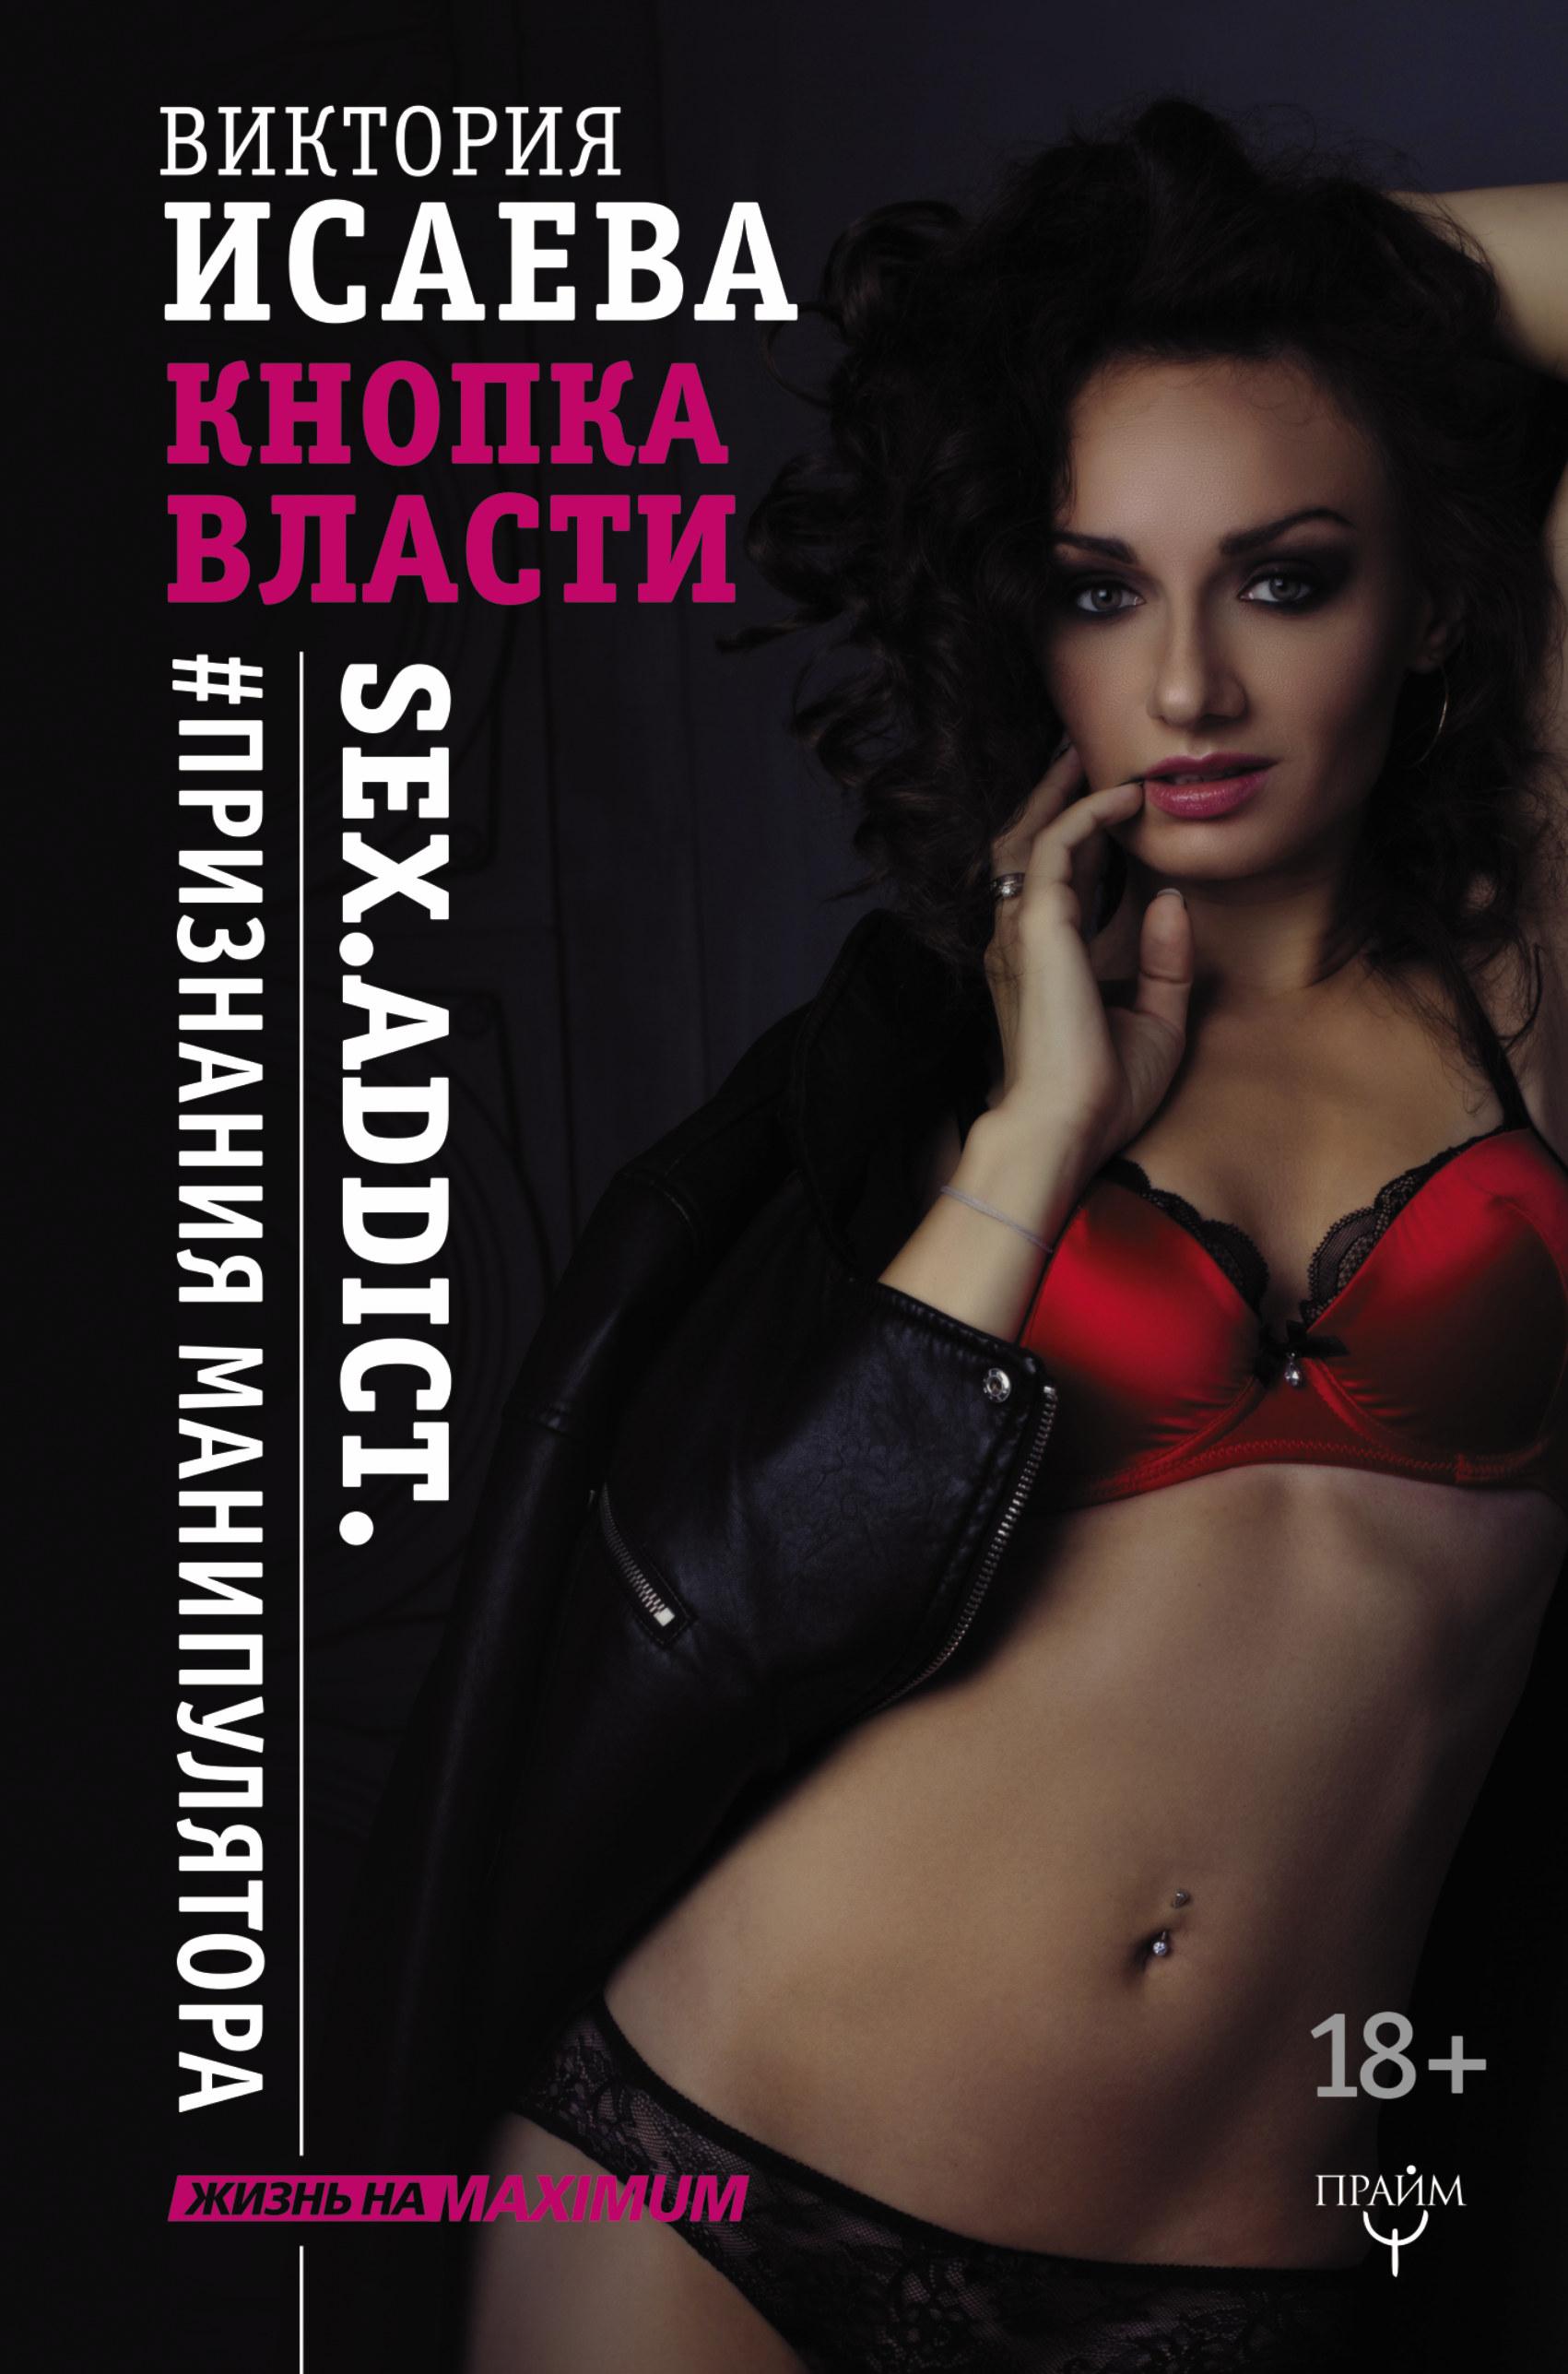 Кнопка Власти. Sex. Addict. #Признания манипулятора